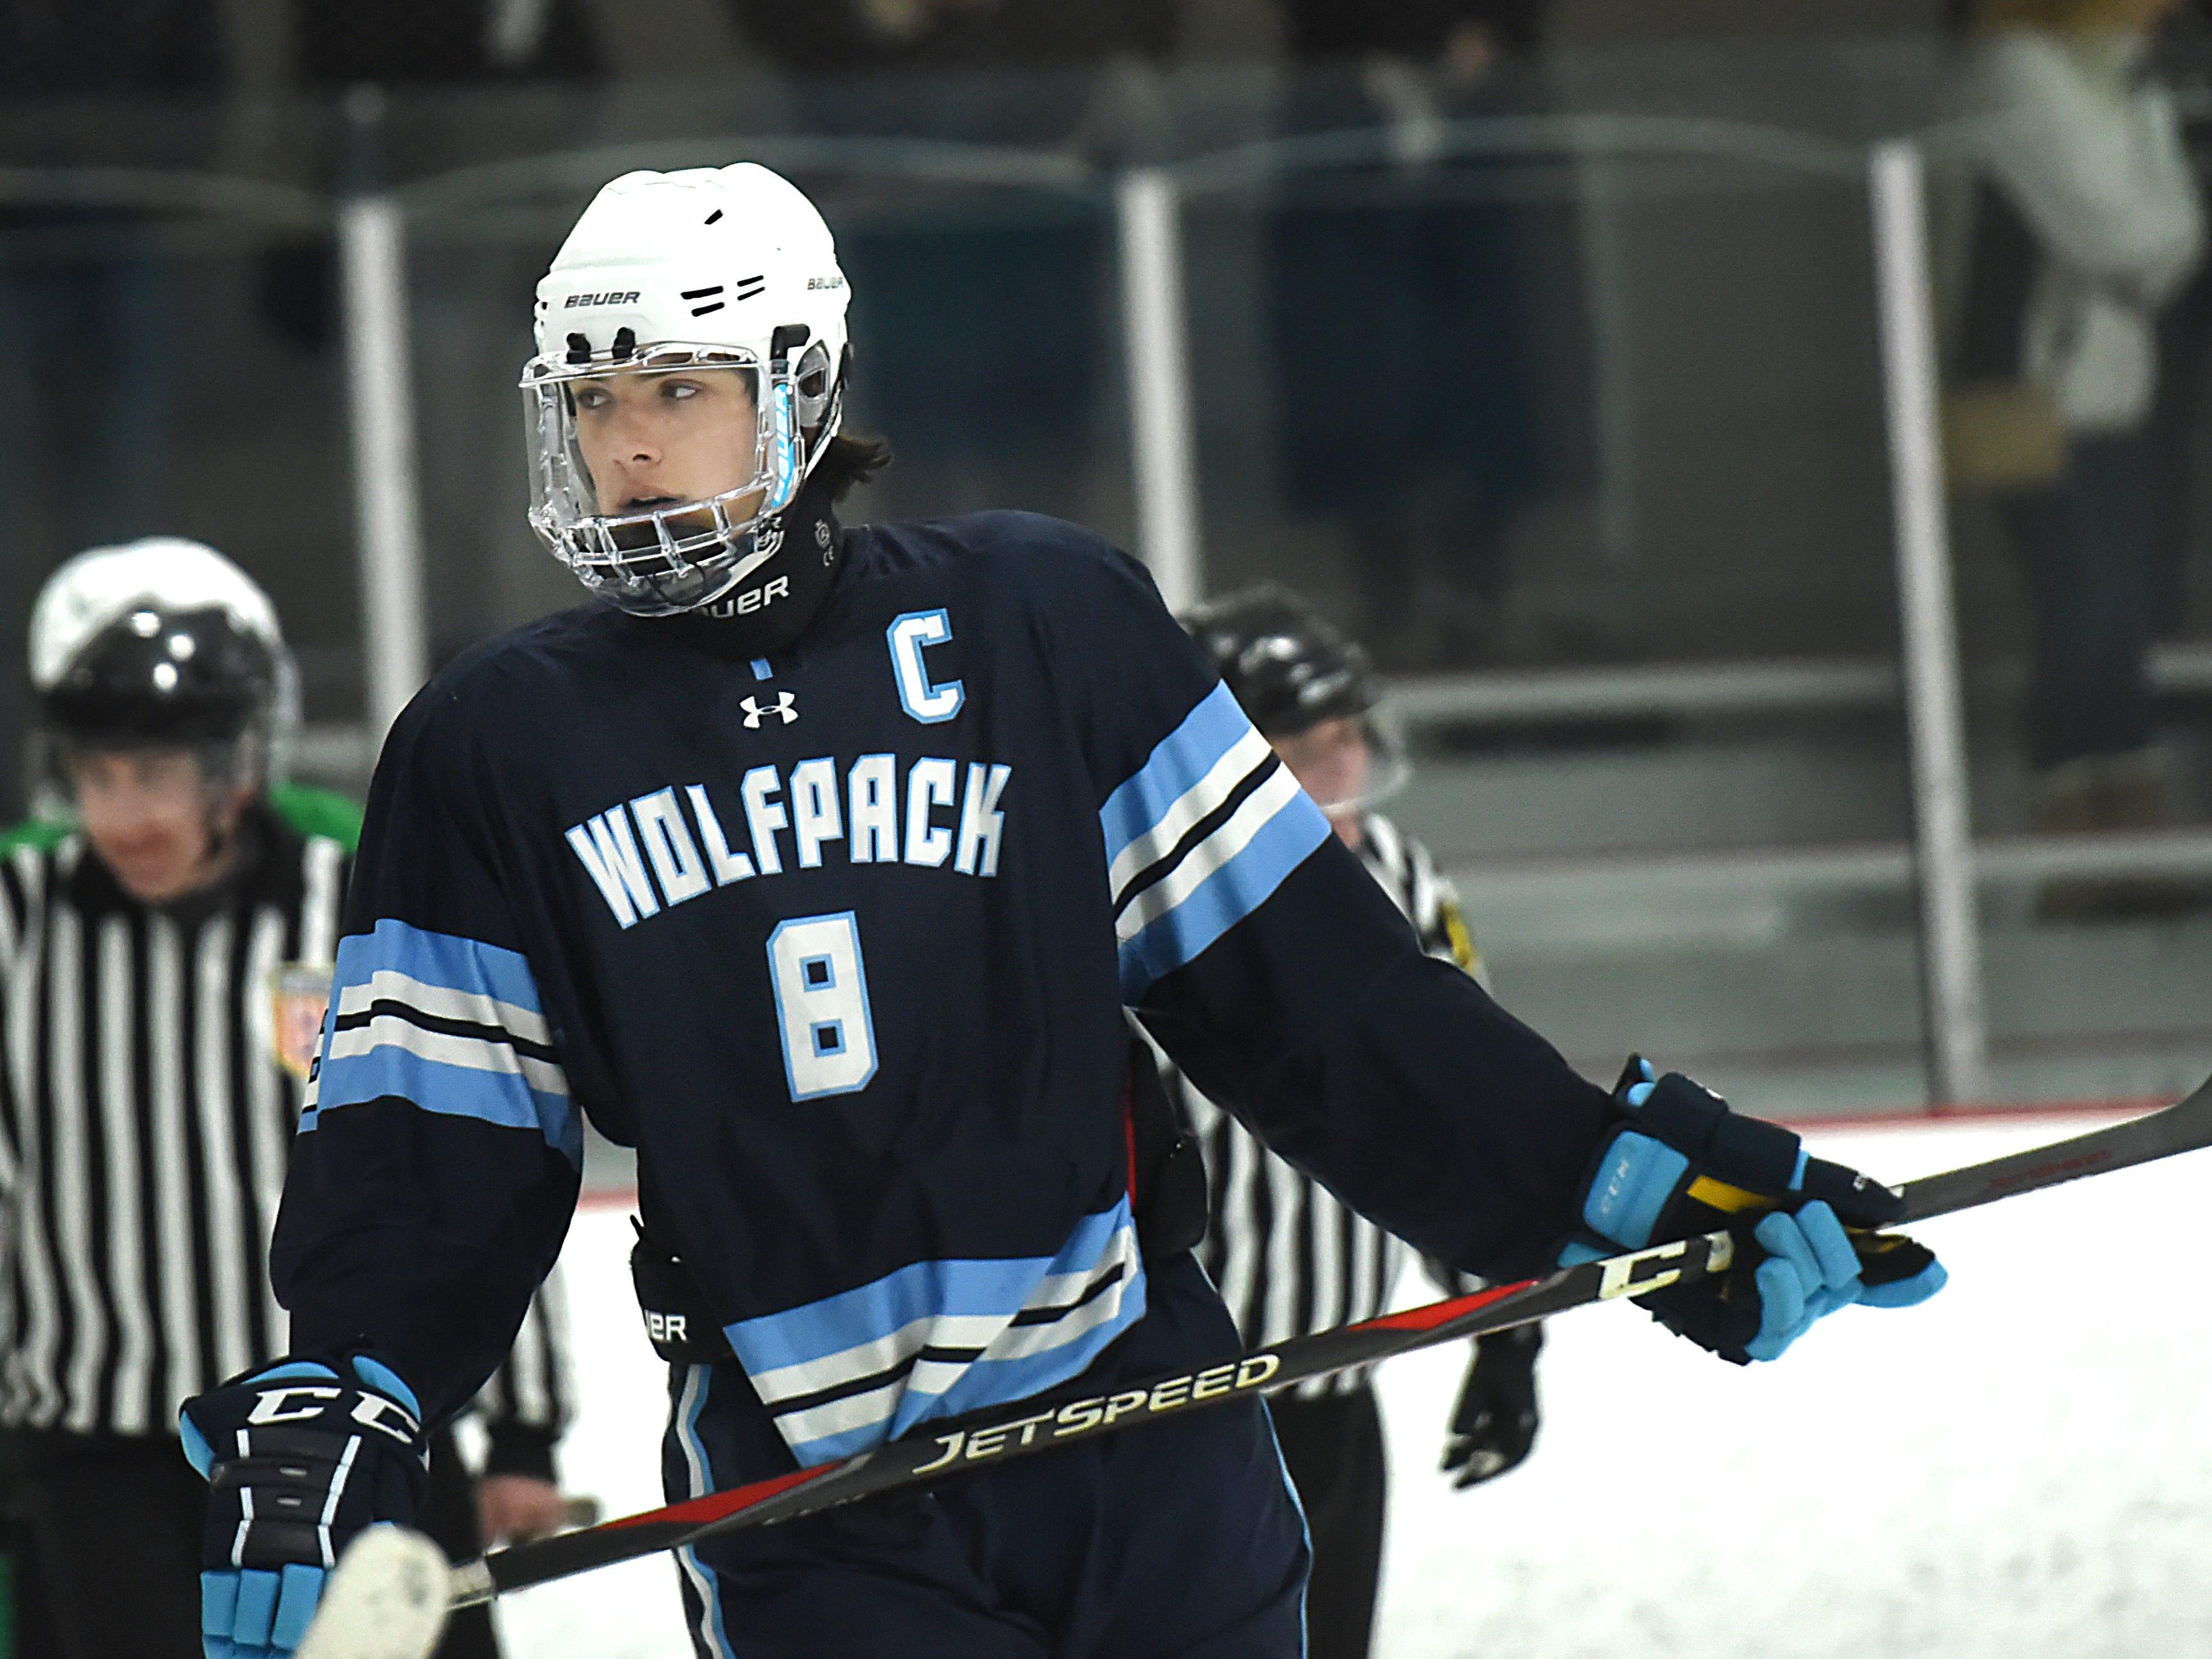 Kinnelon vs. West Morris hockey game at Skylands Ice World in Stockholm on Friday January 11, 2019. WM#8 Zack Mosser.